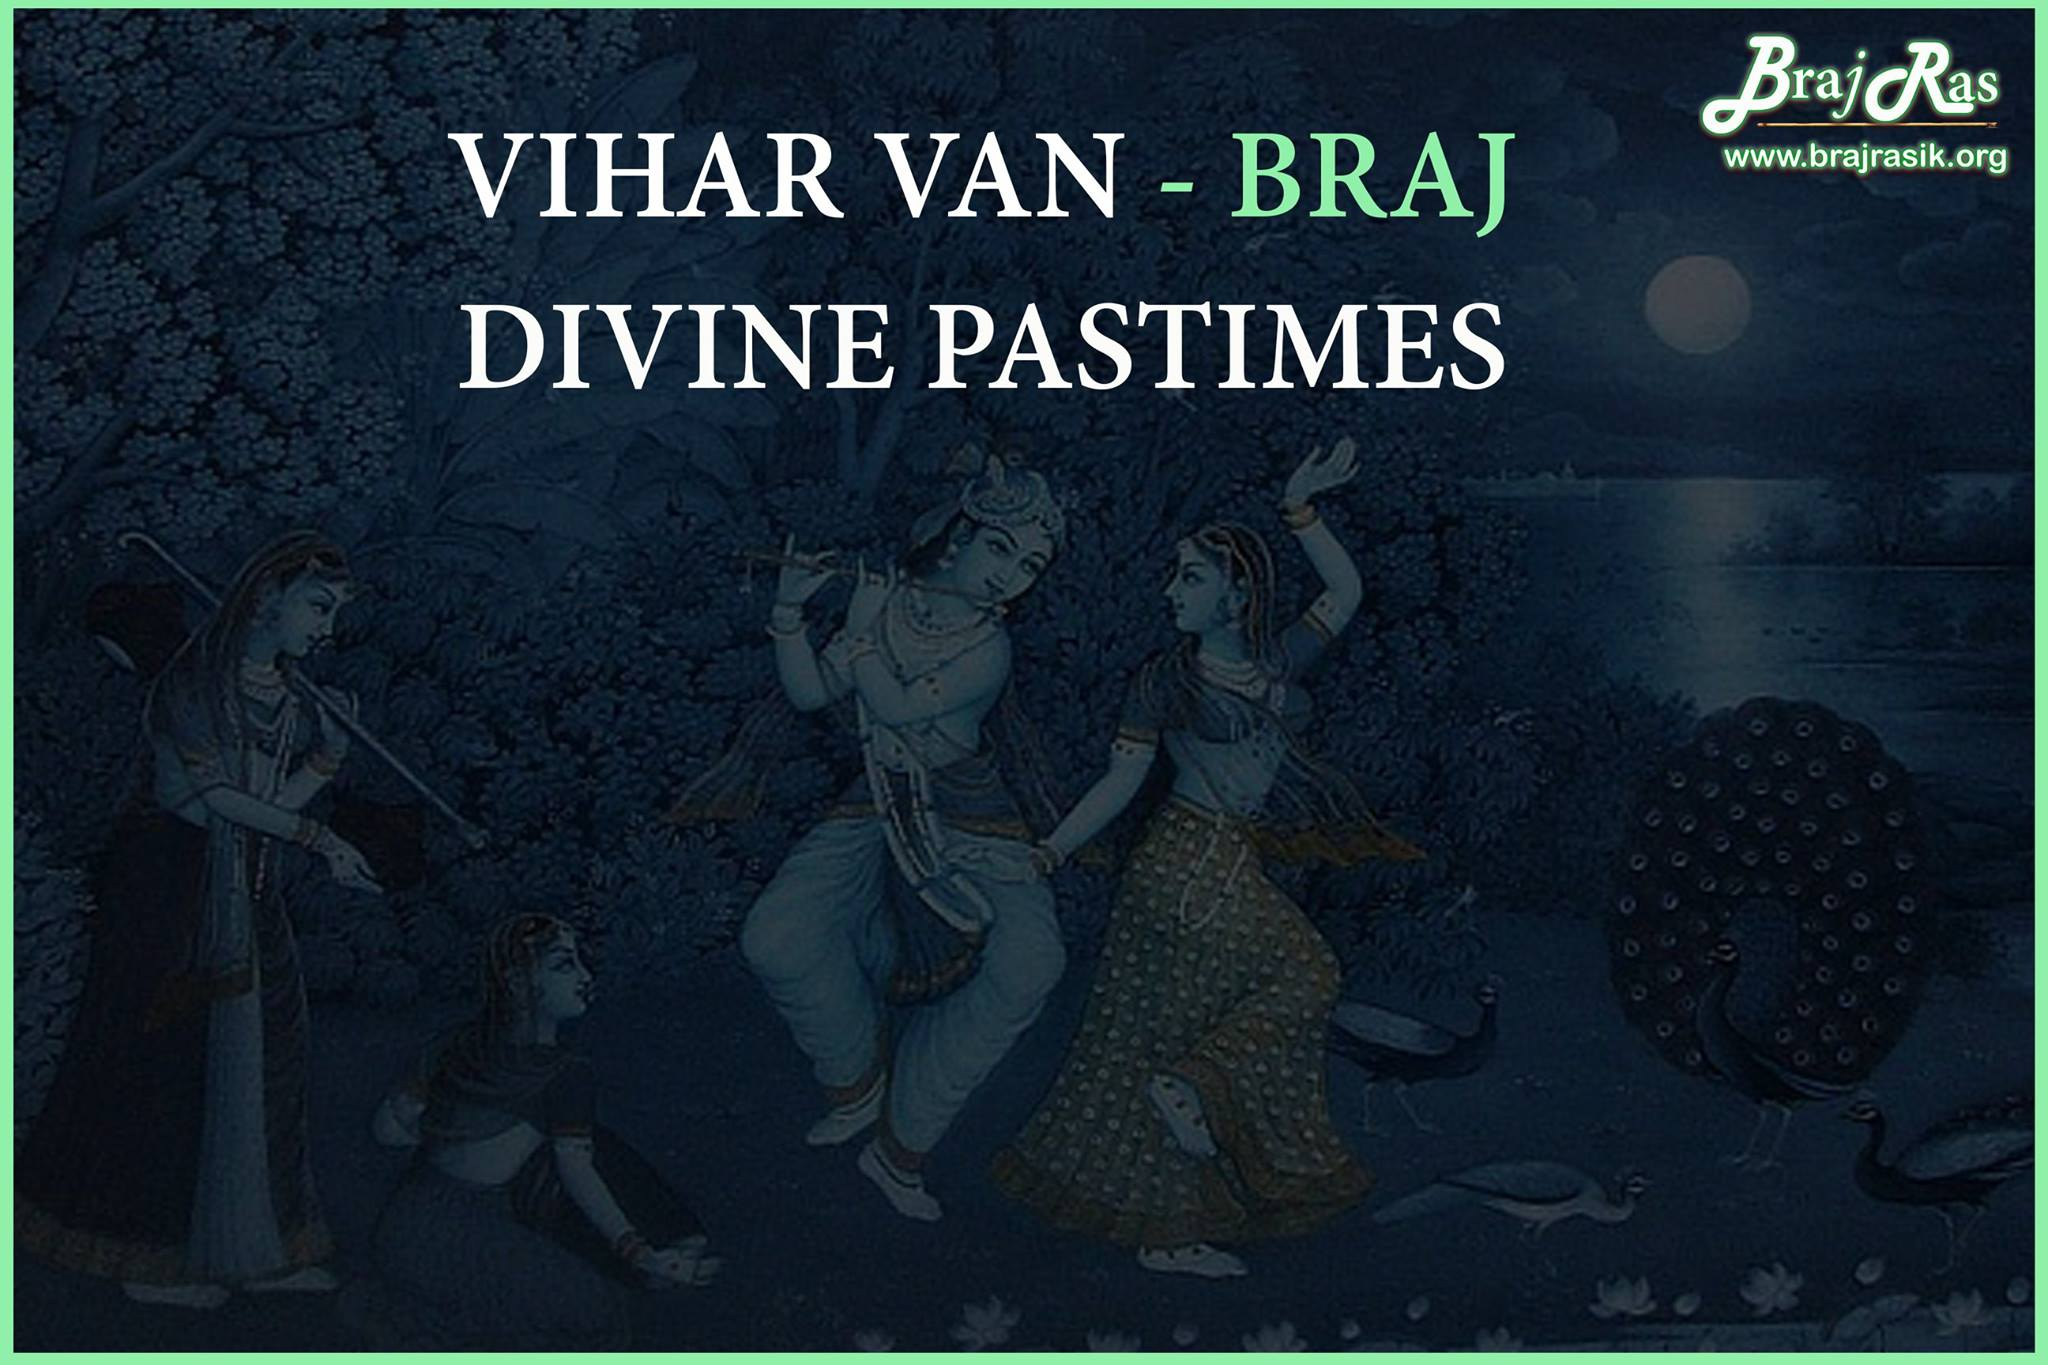 Vihar Van, Braj - Excursion forest